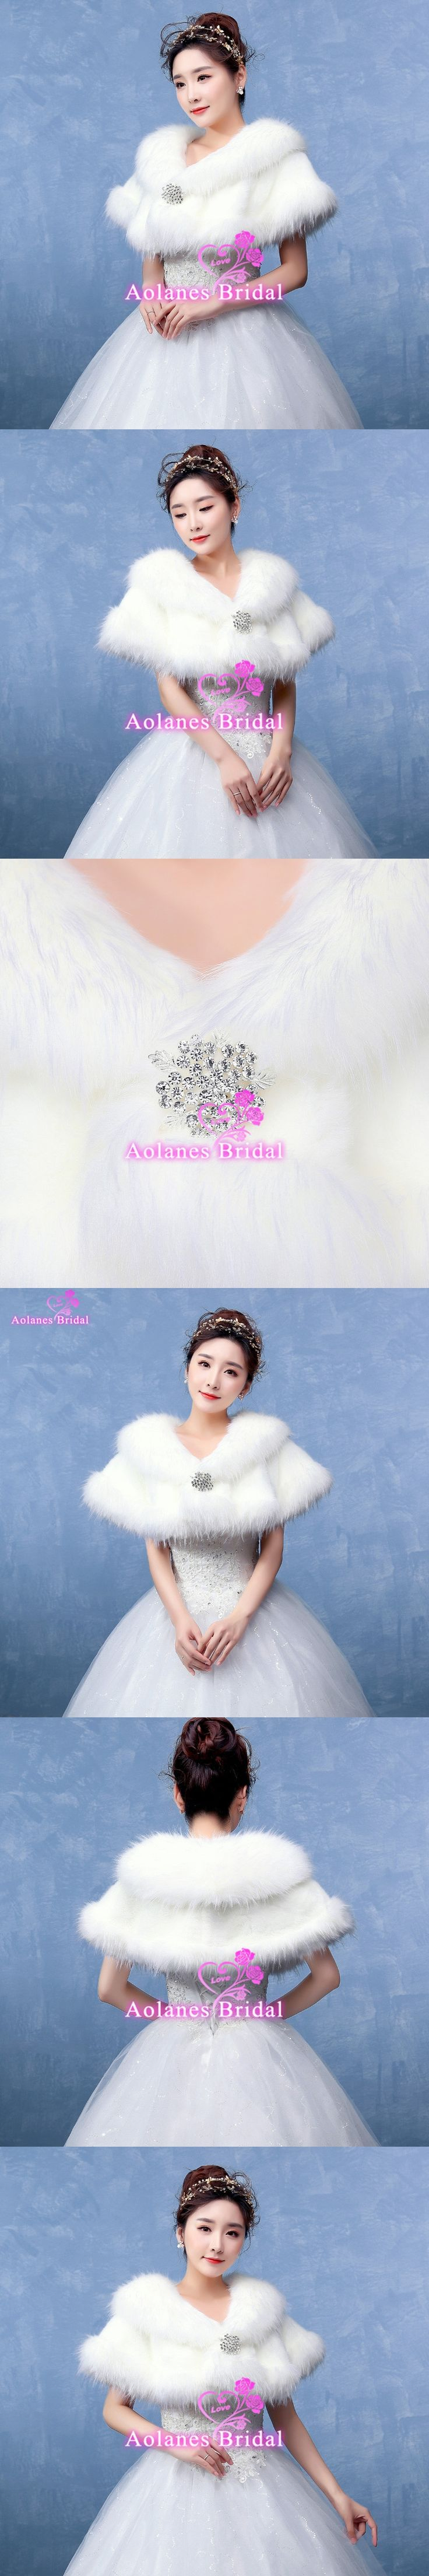 Bolero Ivory Bridal Wraps Winter Wedding Cape Faux Fur Elegant Ladies Evening Jackets Wedding Shawl Shrug Boleros